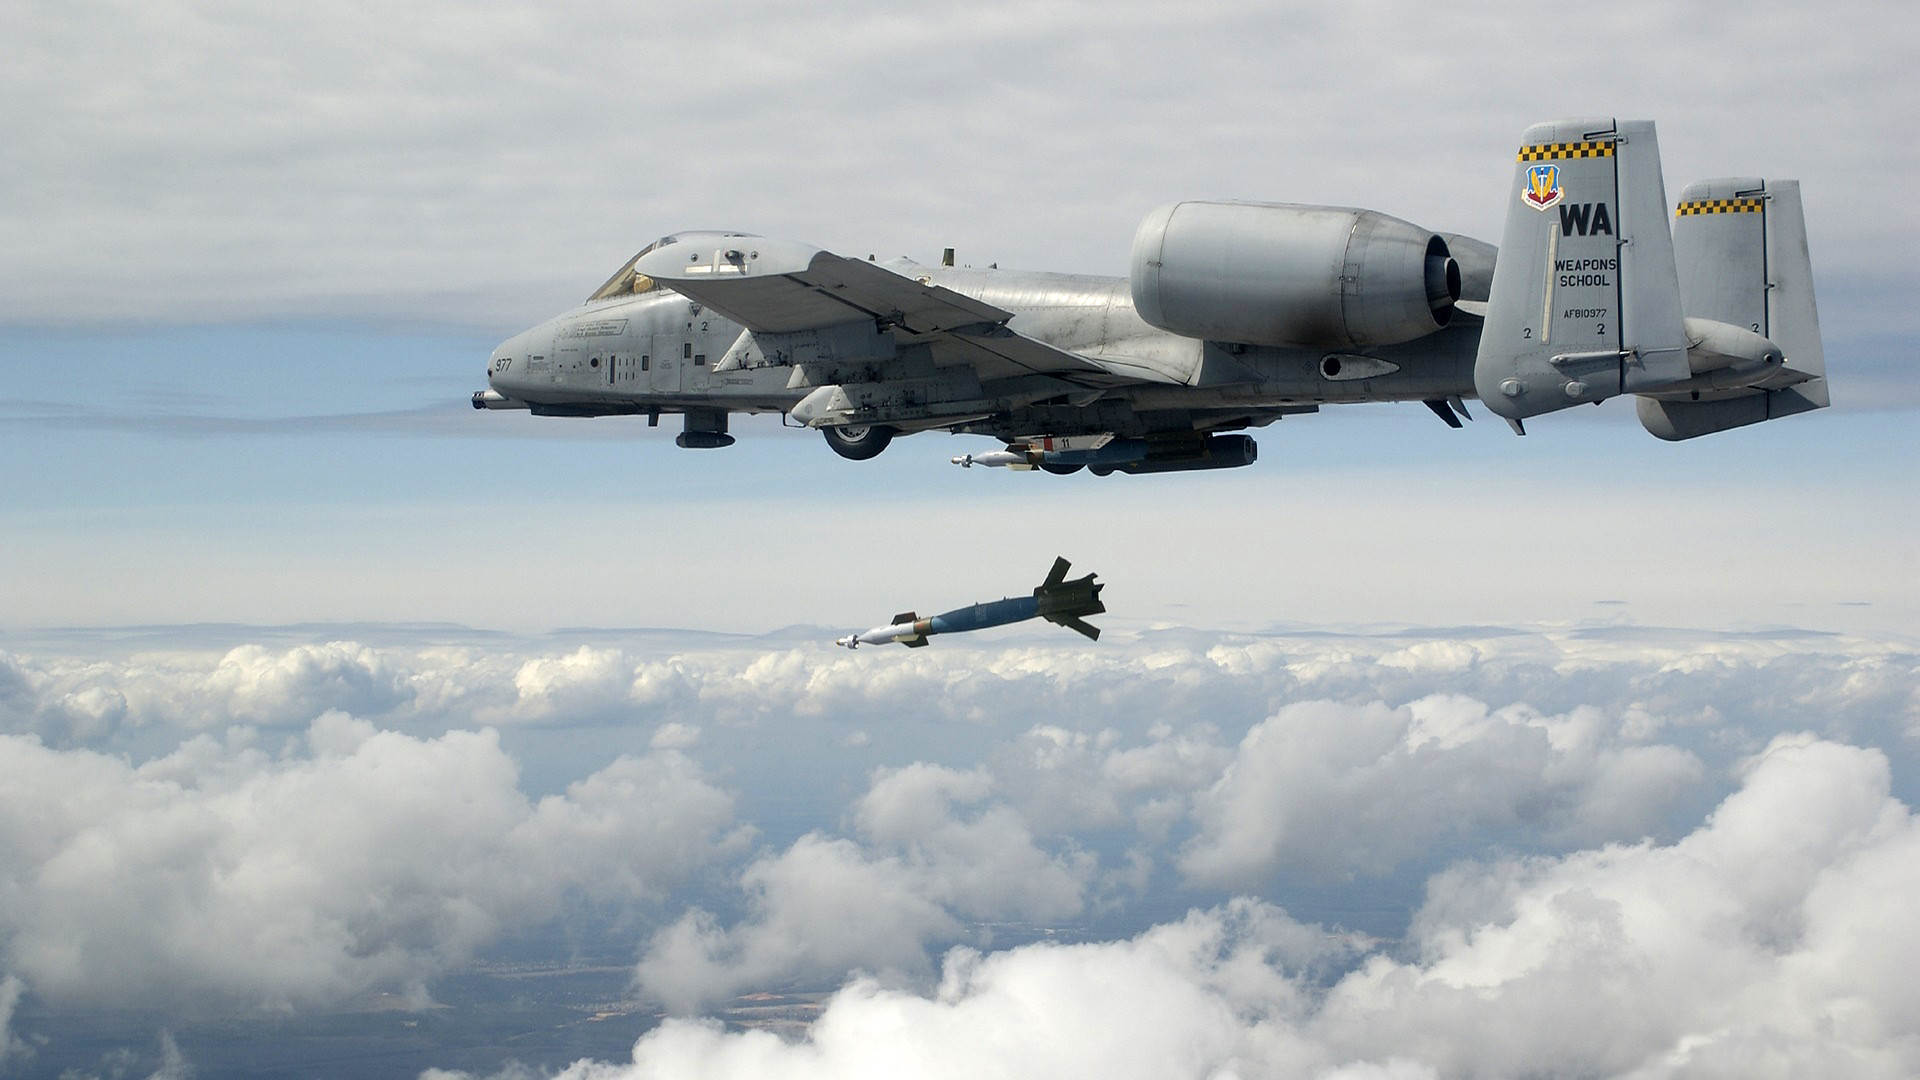 A10 Warthog Aircraft Bomb Planes Sky